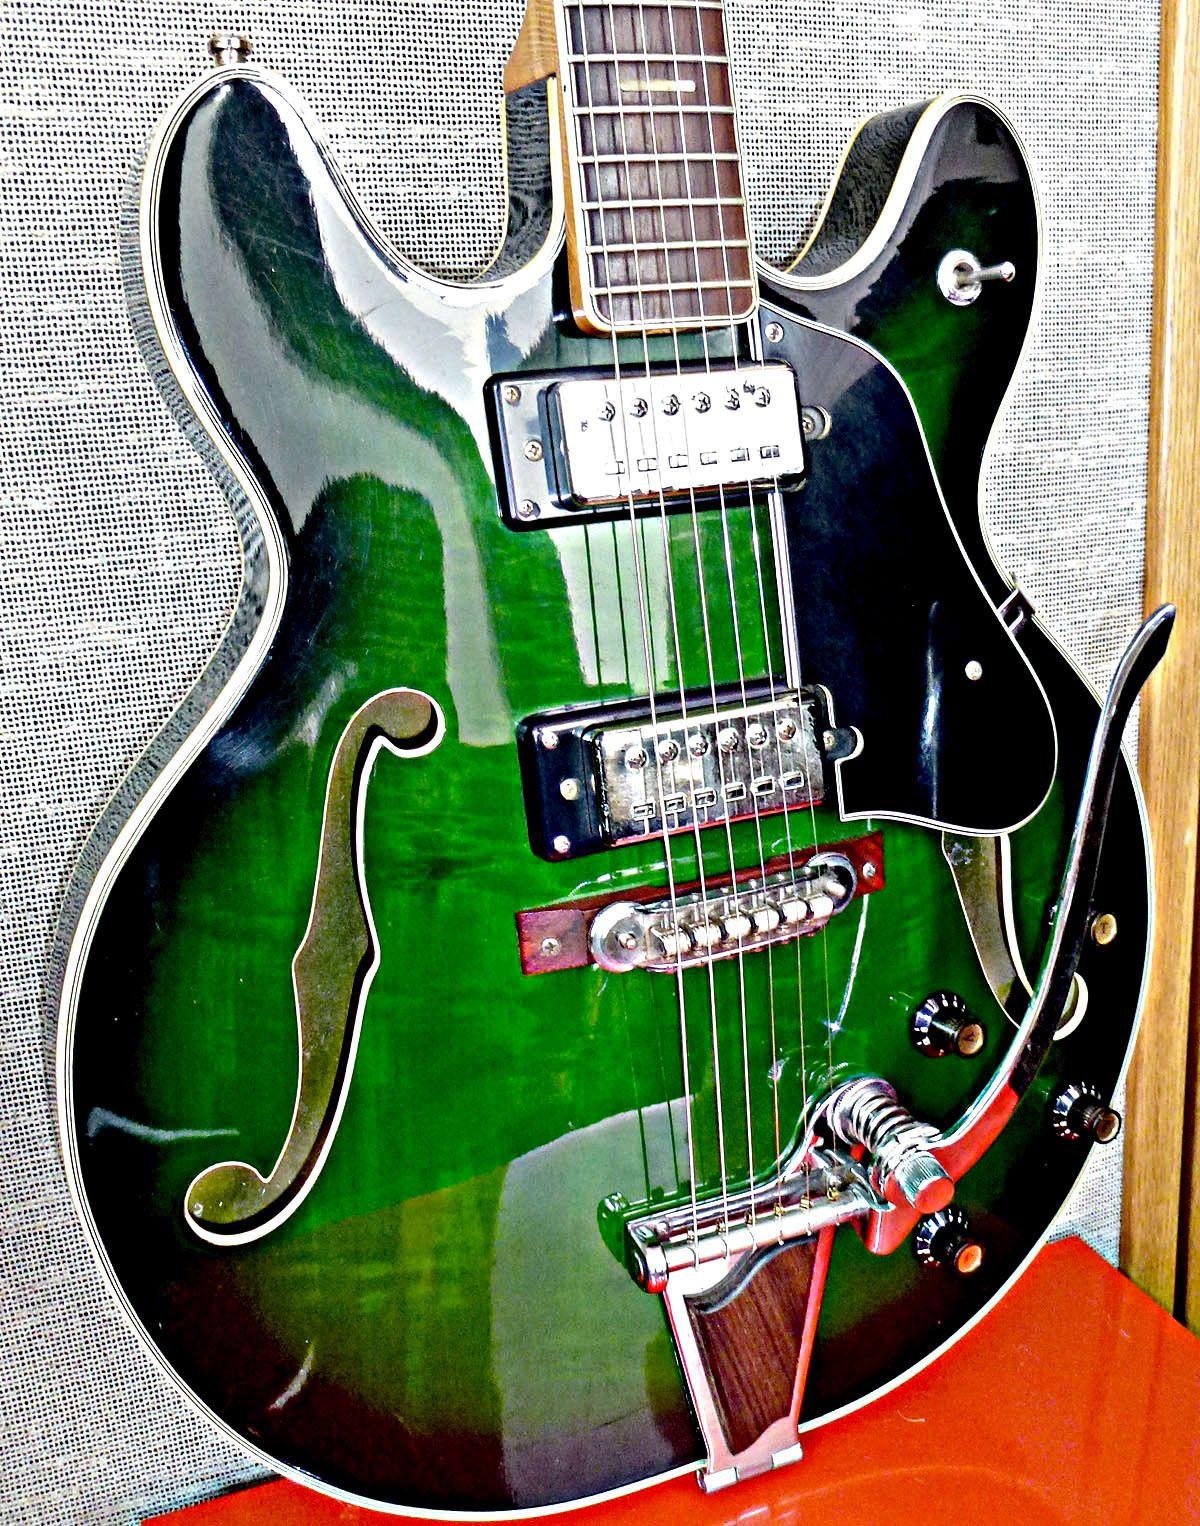 Vintage 1965 Gibson Es345 Wiring Repair Chicago Fret Works Guitar 1960 1970 S Univox 335 Electric Japan Guitars Rh Pinterest Com